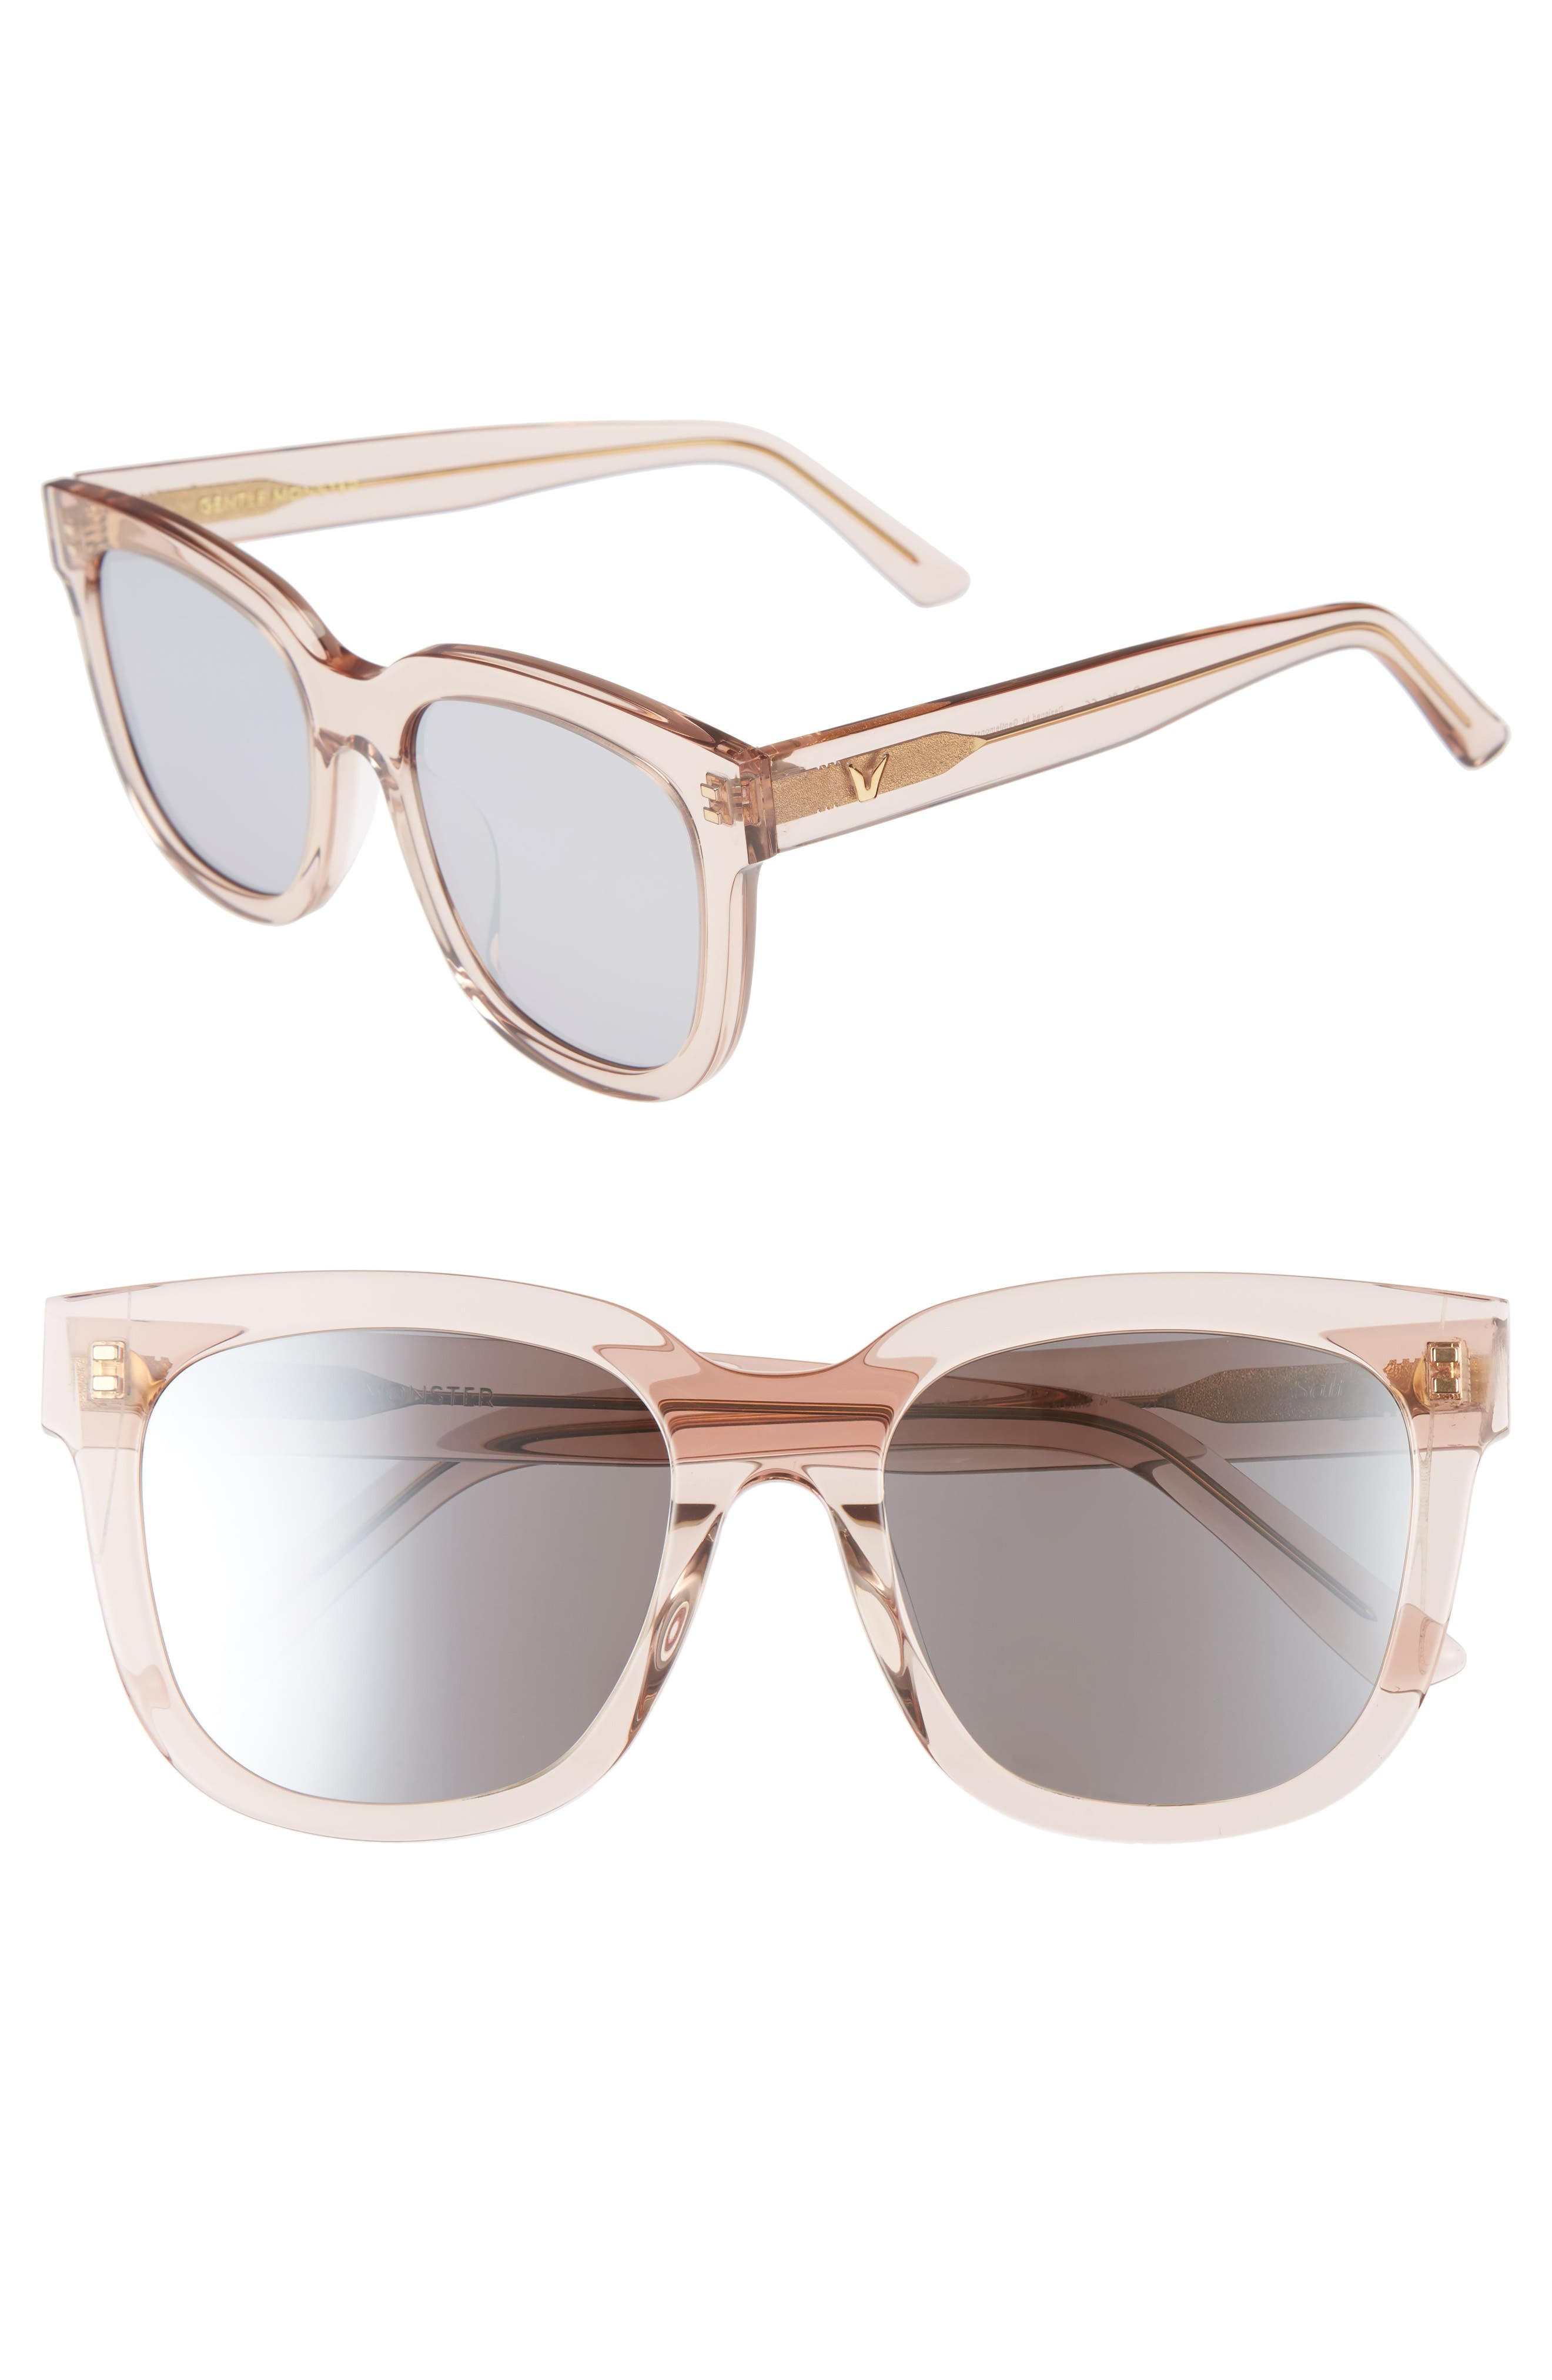 Salt 55mm Sunglasses,                             Main thumbnail 4, color,